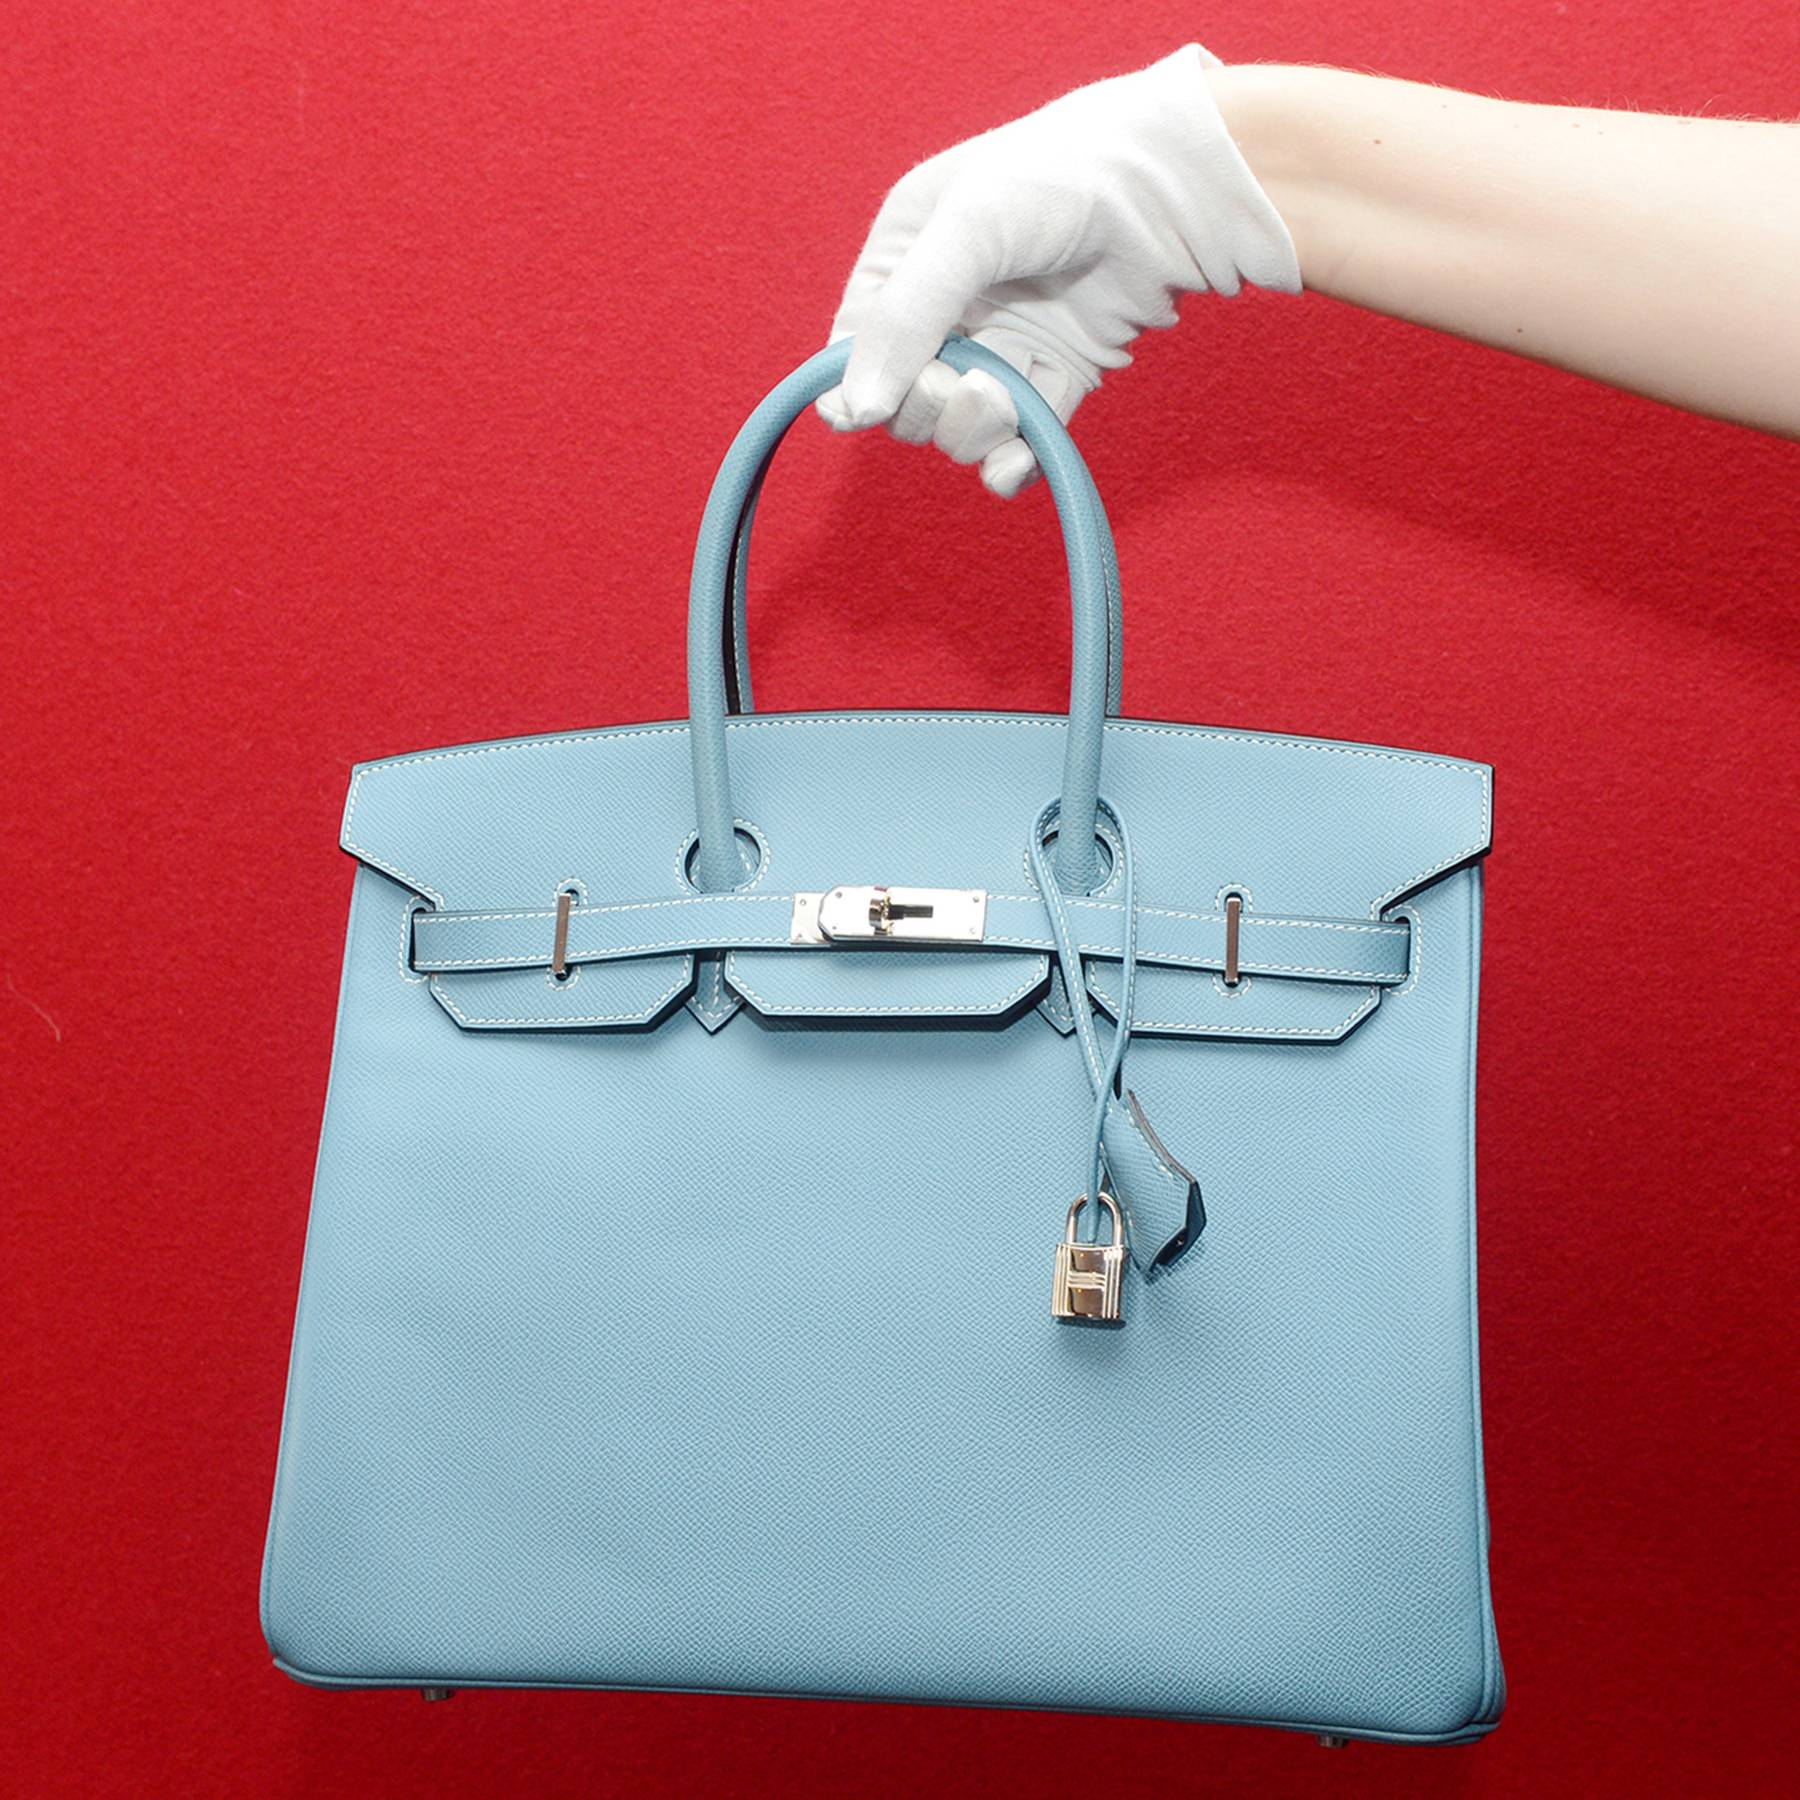 c523c39283b0 Preview  Christie s Handbags   Accessiories sale 2018